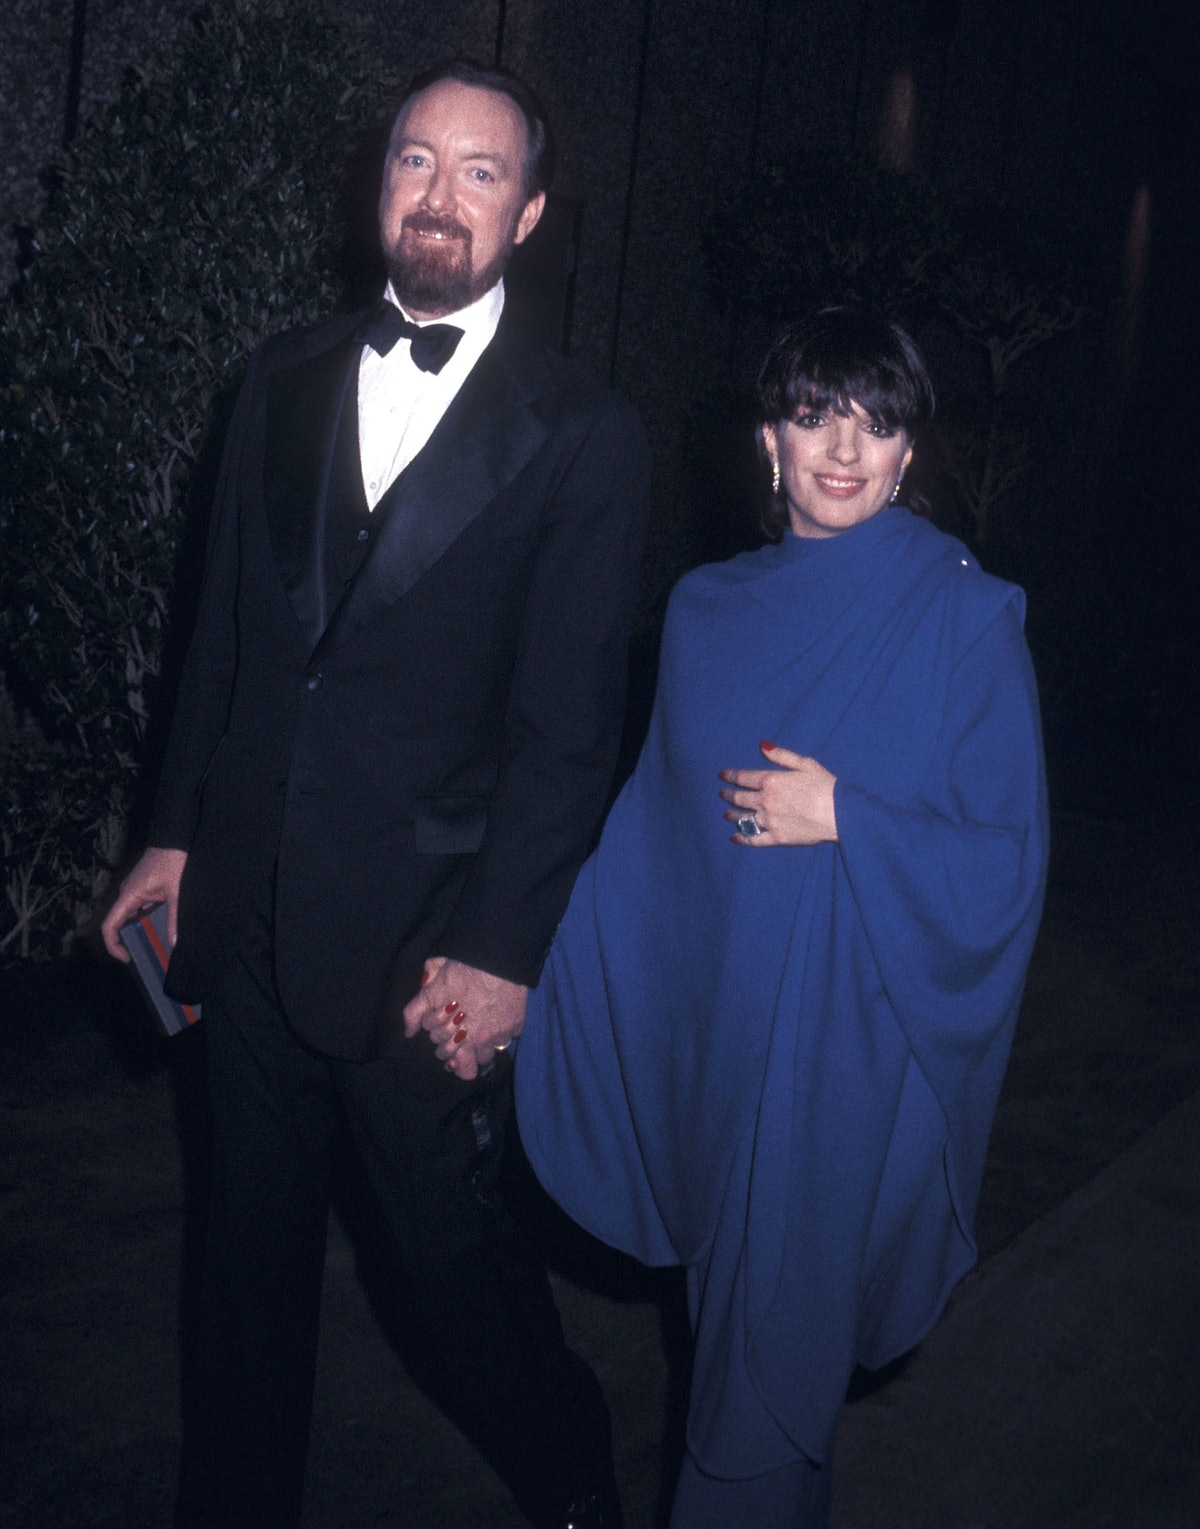 Jack Haley Jr in a black tux, Liza in a blue ensemble